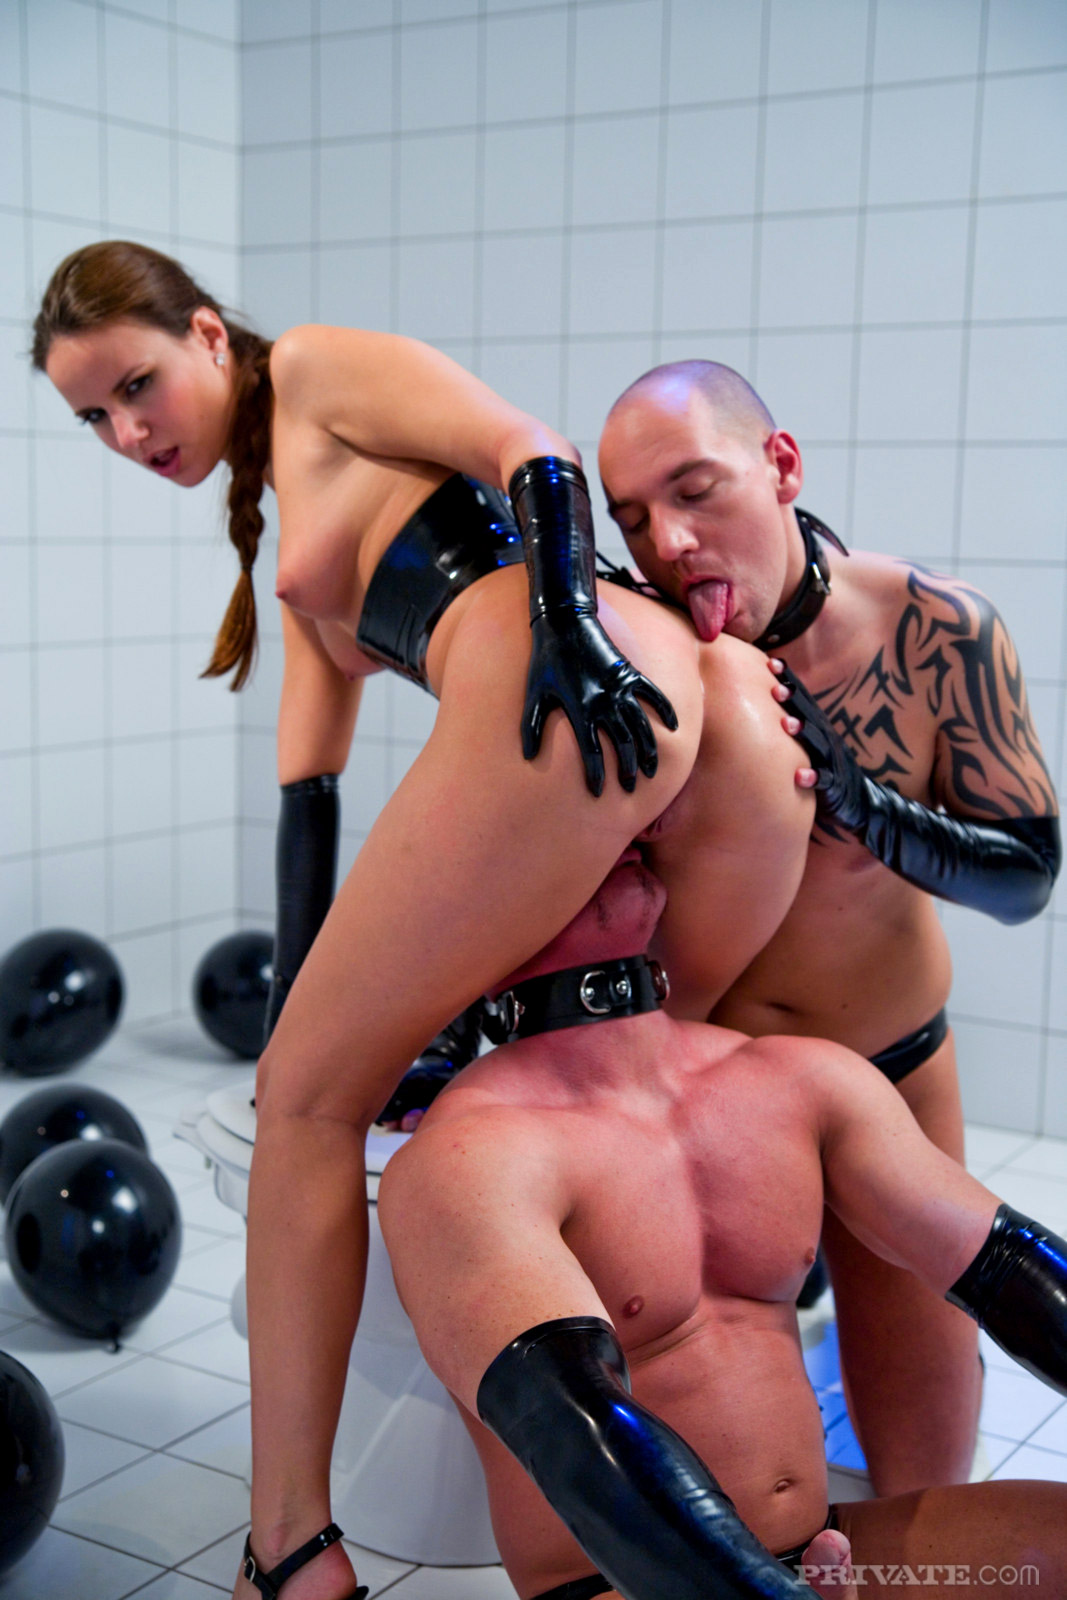 swingerclub bad nendorf femdom kinky